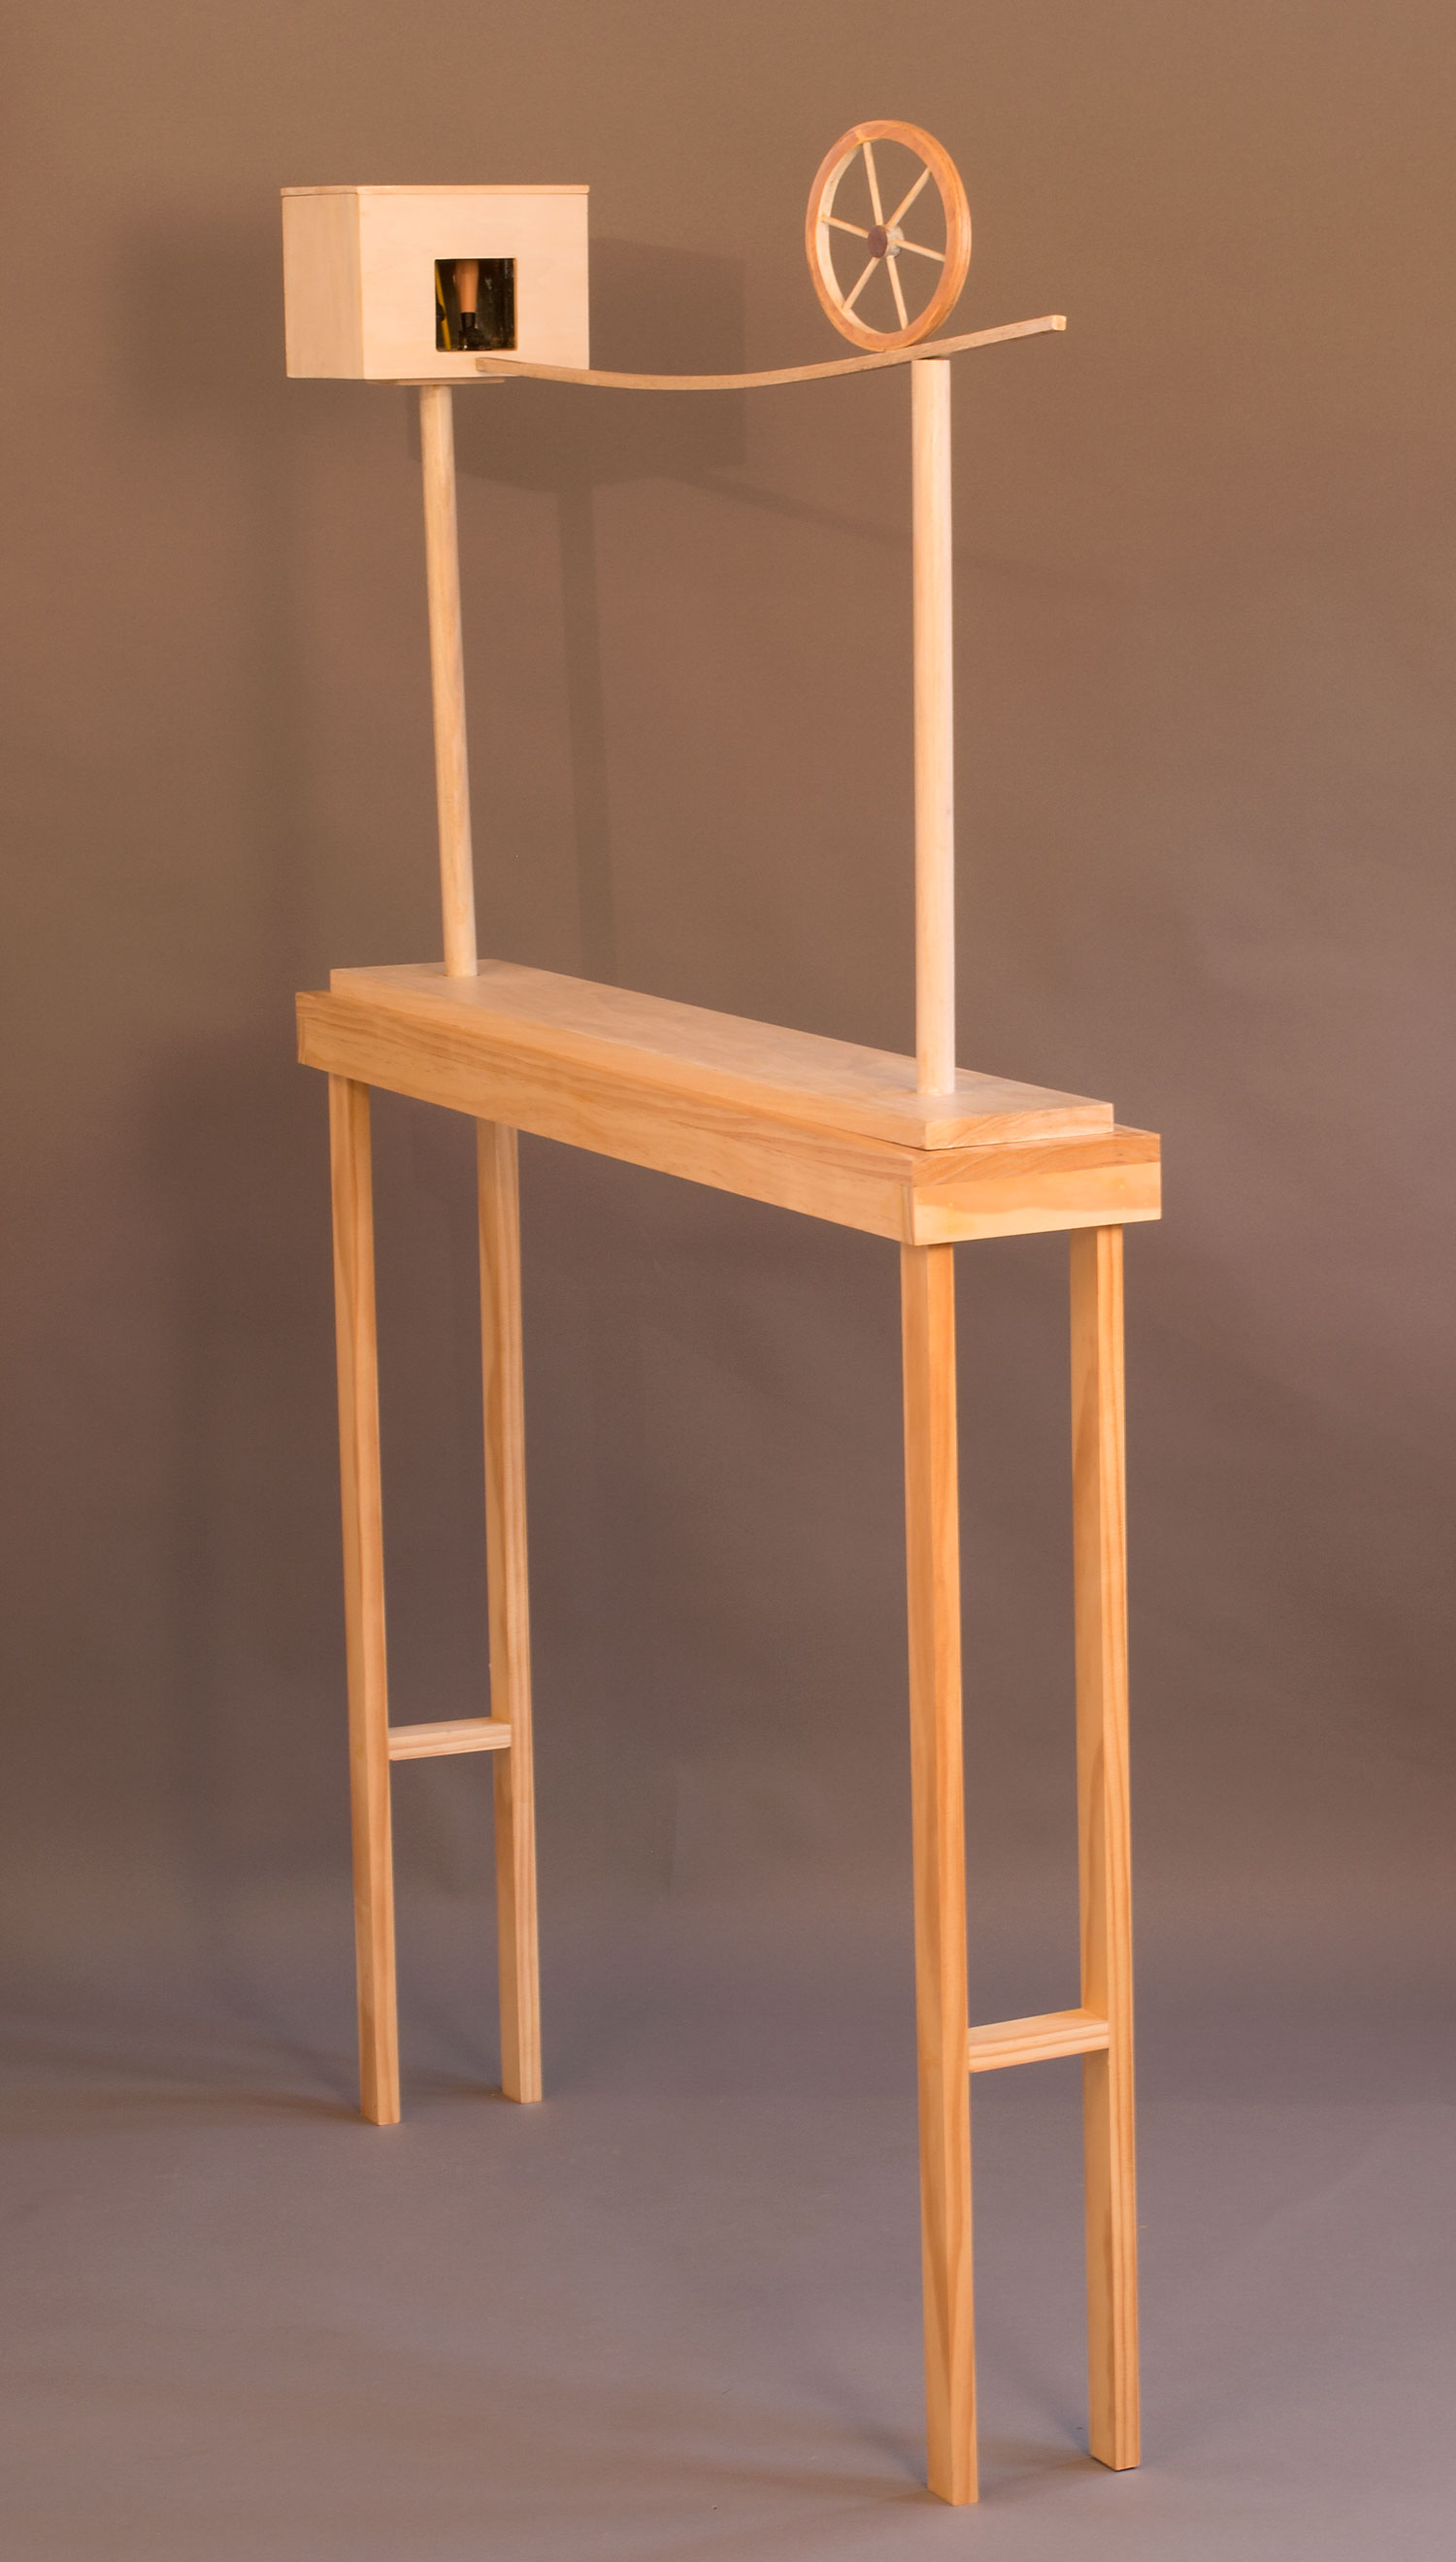 tight-rope-tom-gormally-wood-sculpture.jpg